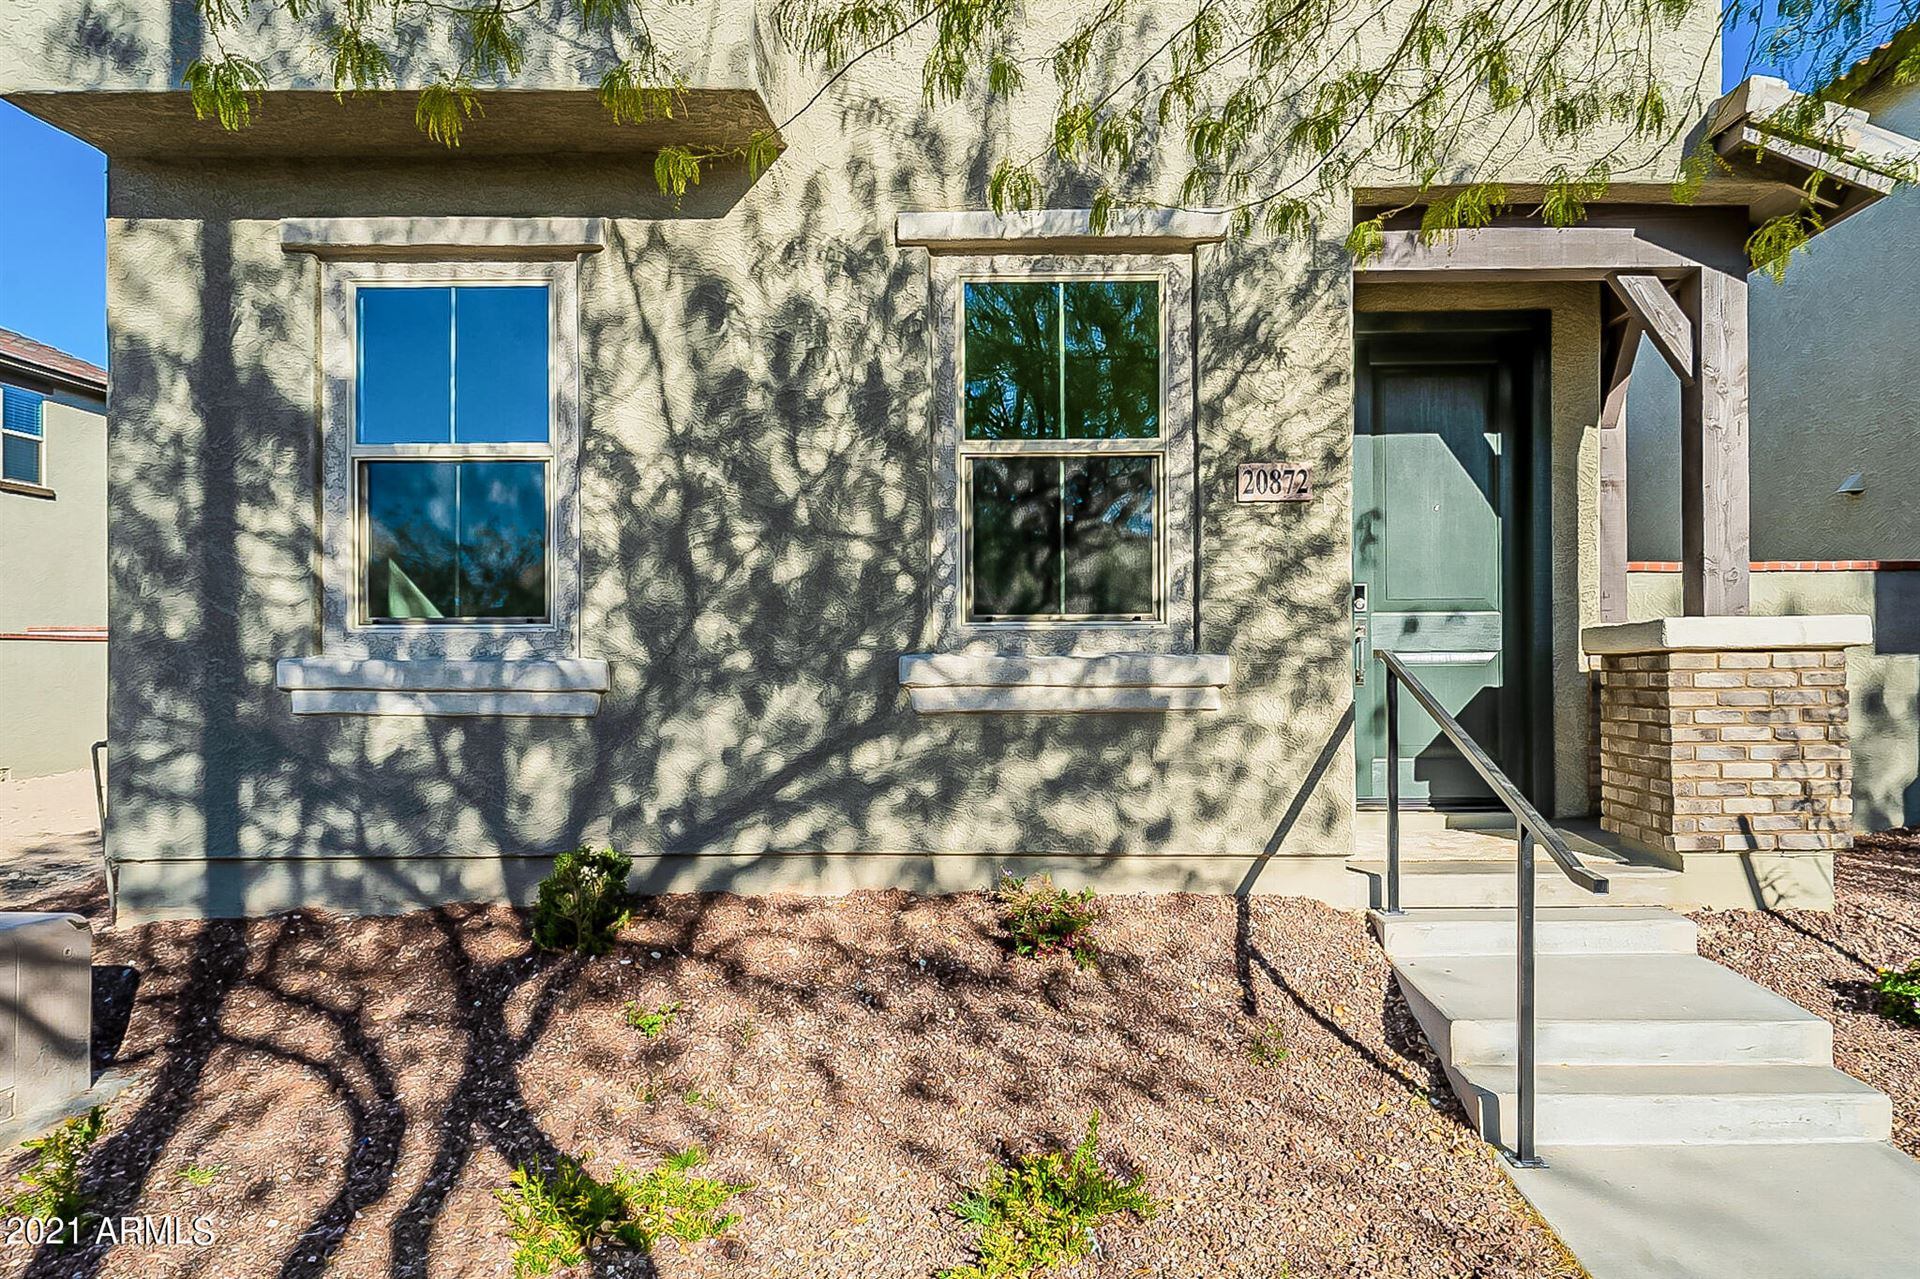 Photo of 20872 W THOMAS Road, Buckeye, AZ 85396 (MLS # 6201834)